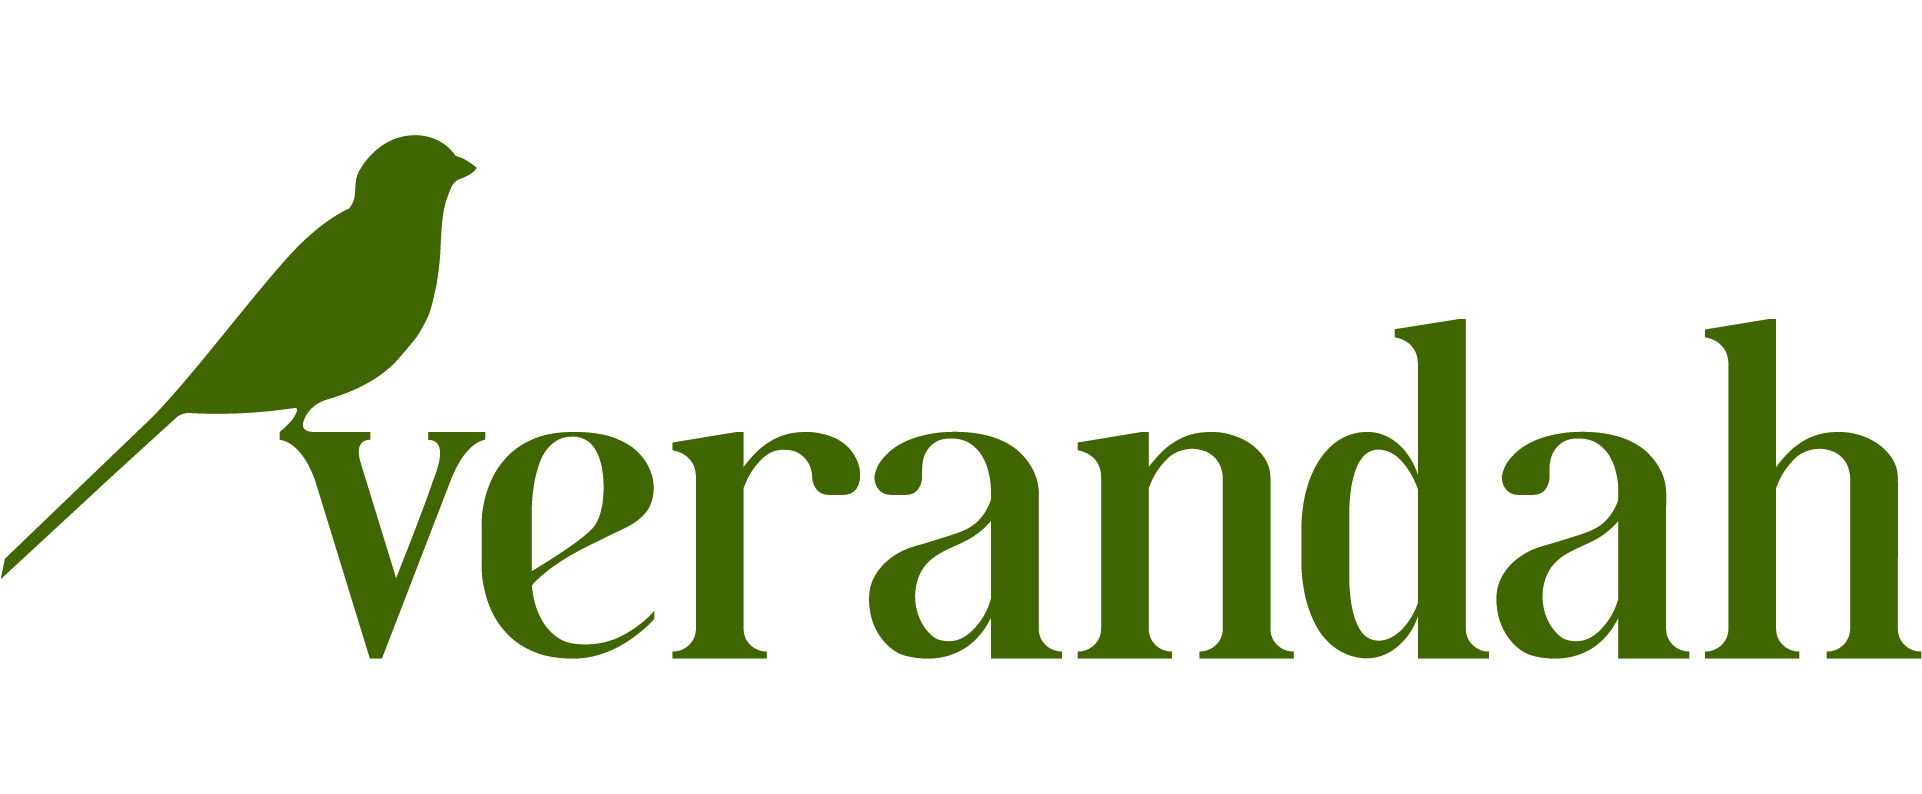 Verandah Logo